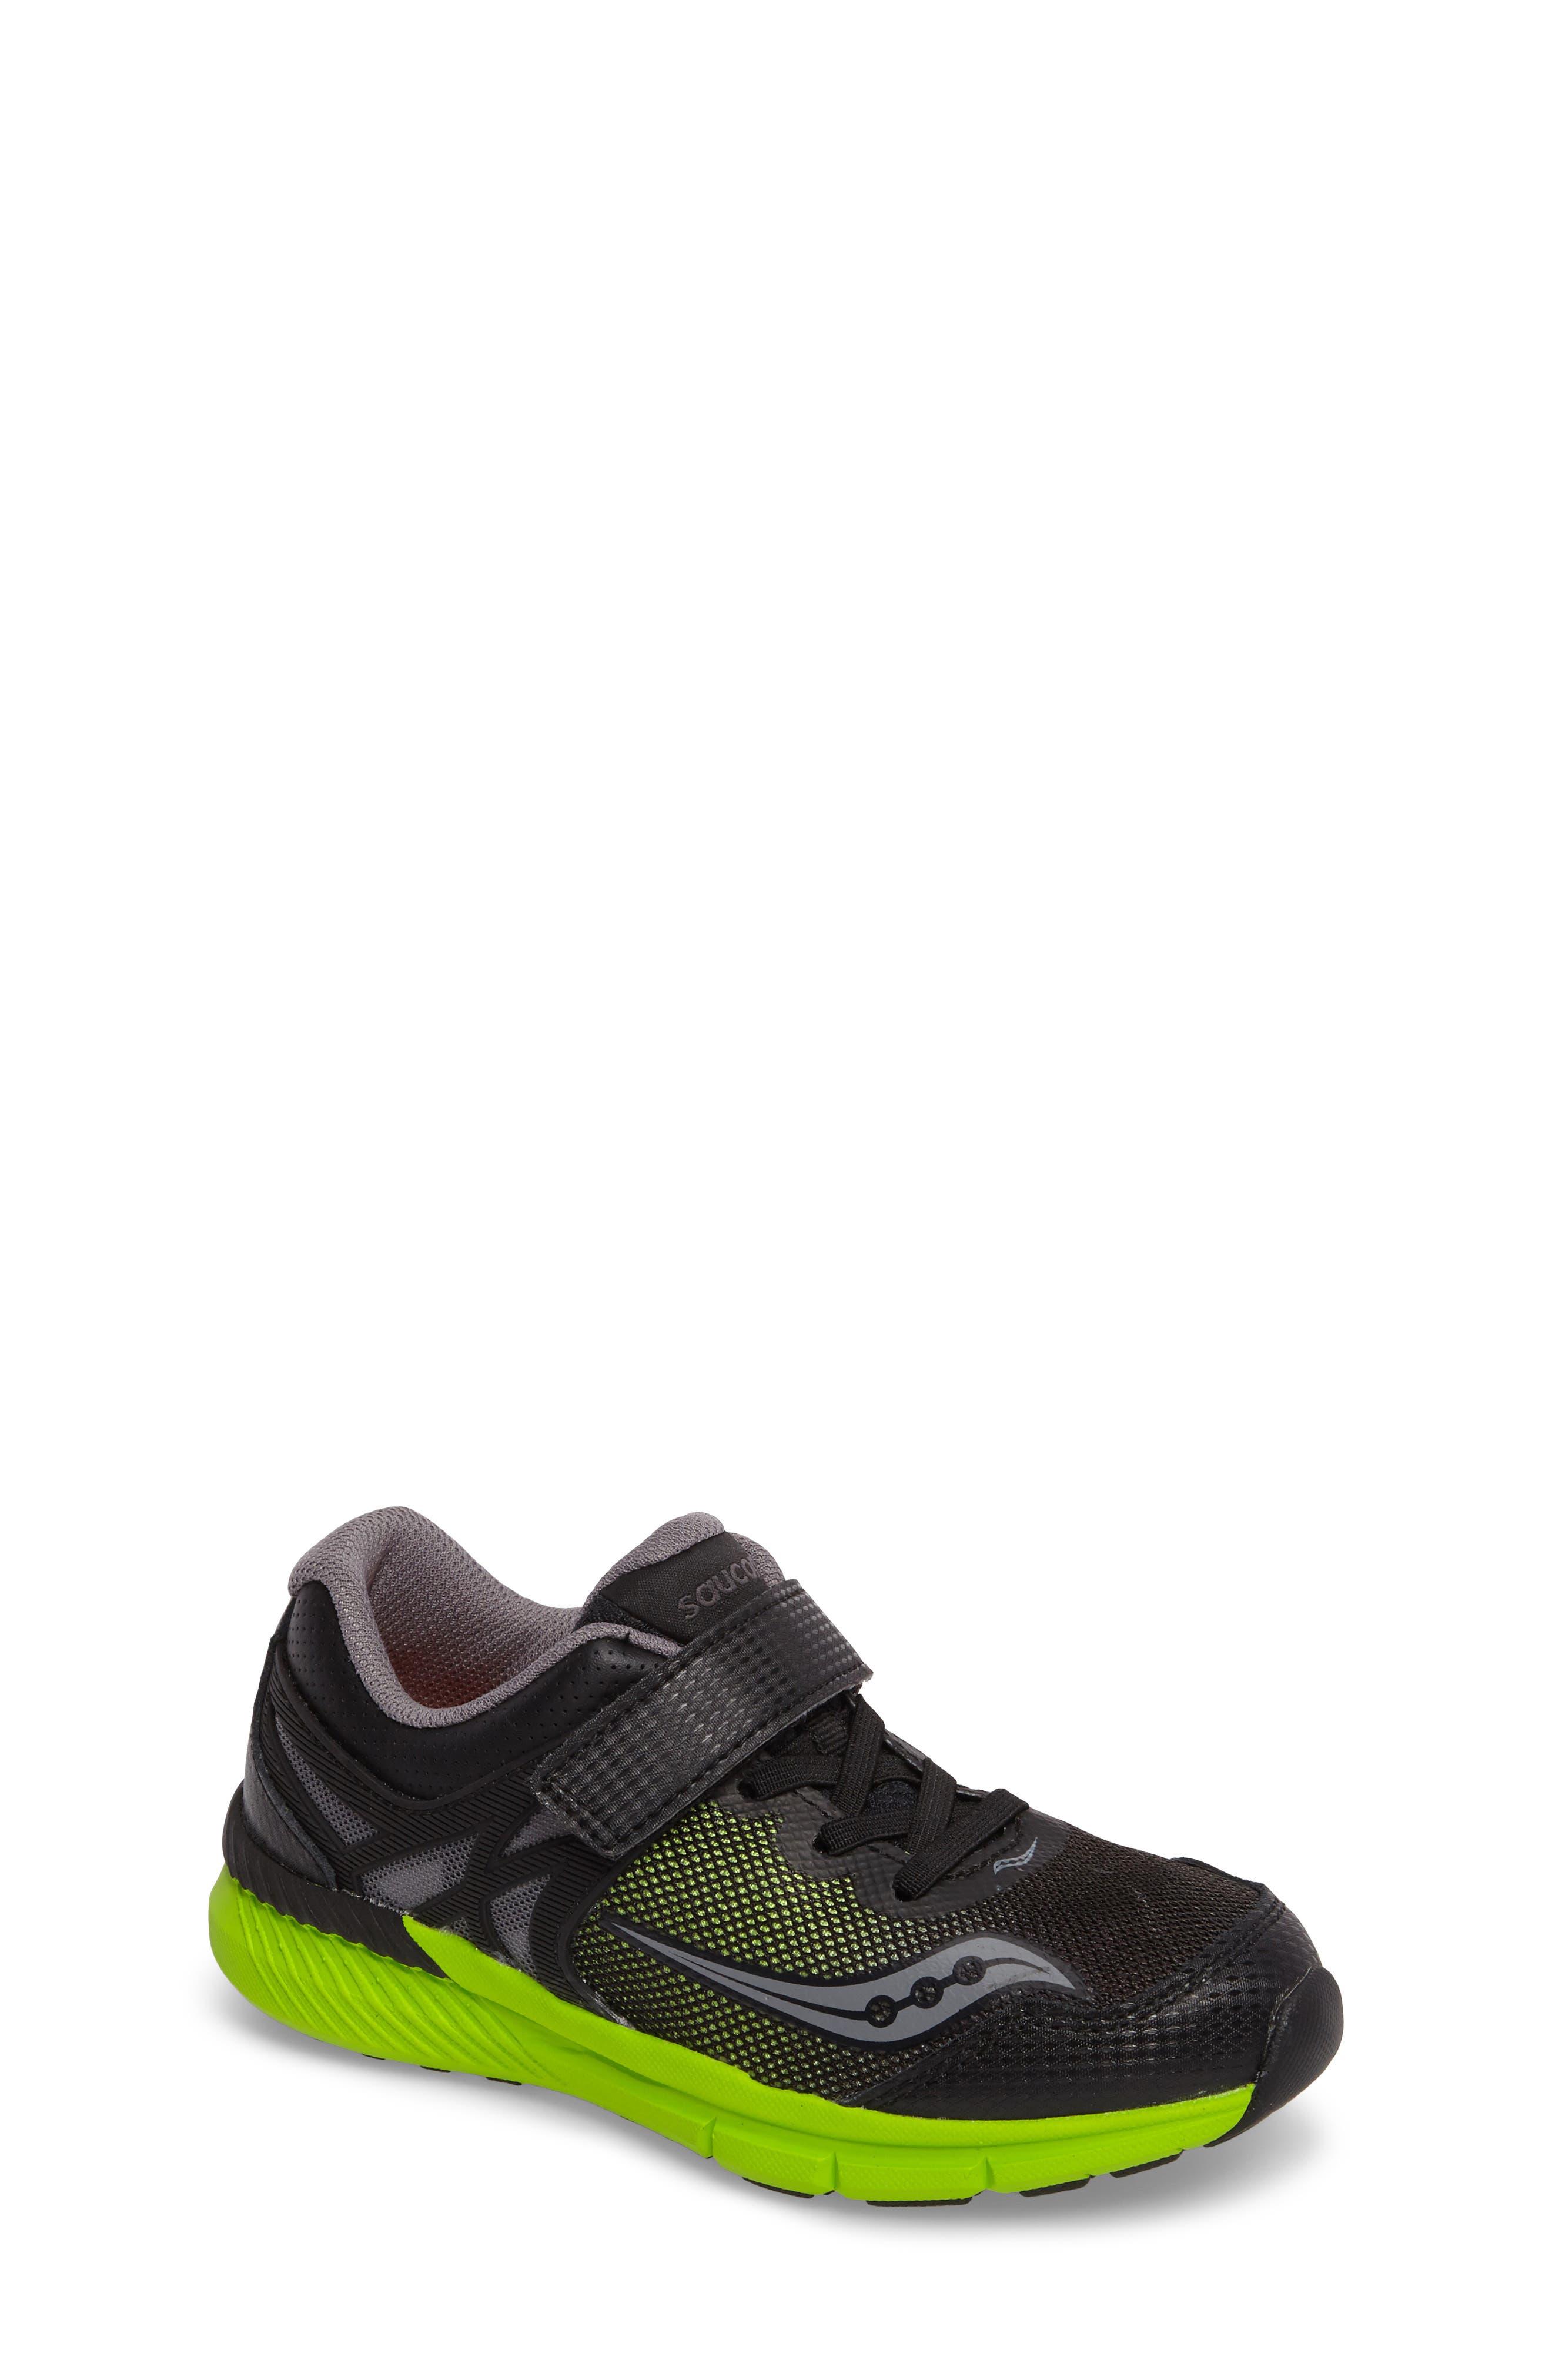 Velocity A/C Sneaker,                             Main thumbnail 1, color,                             001